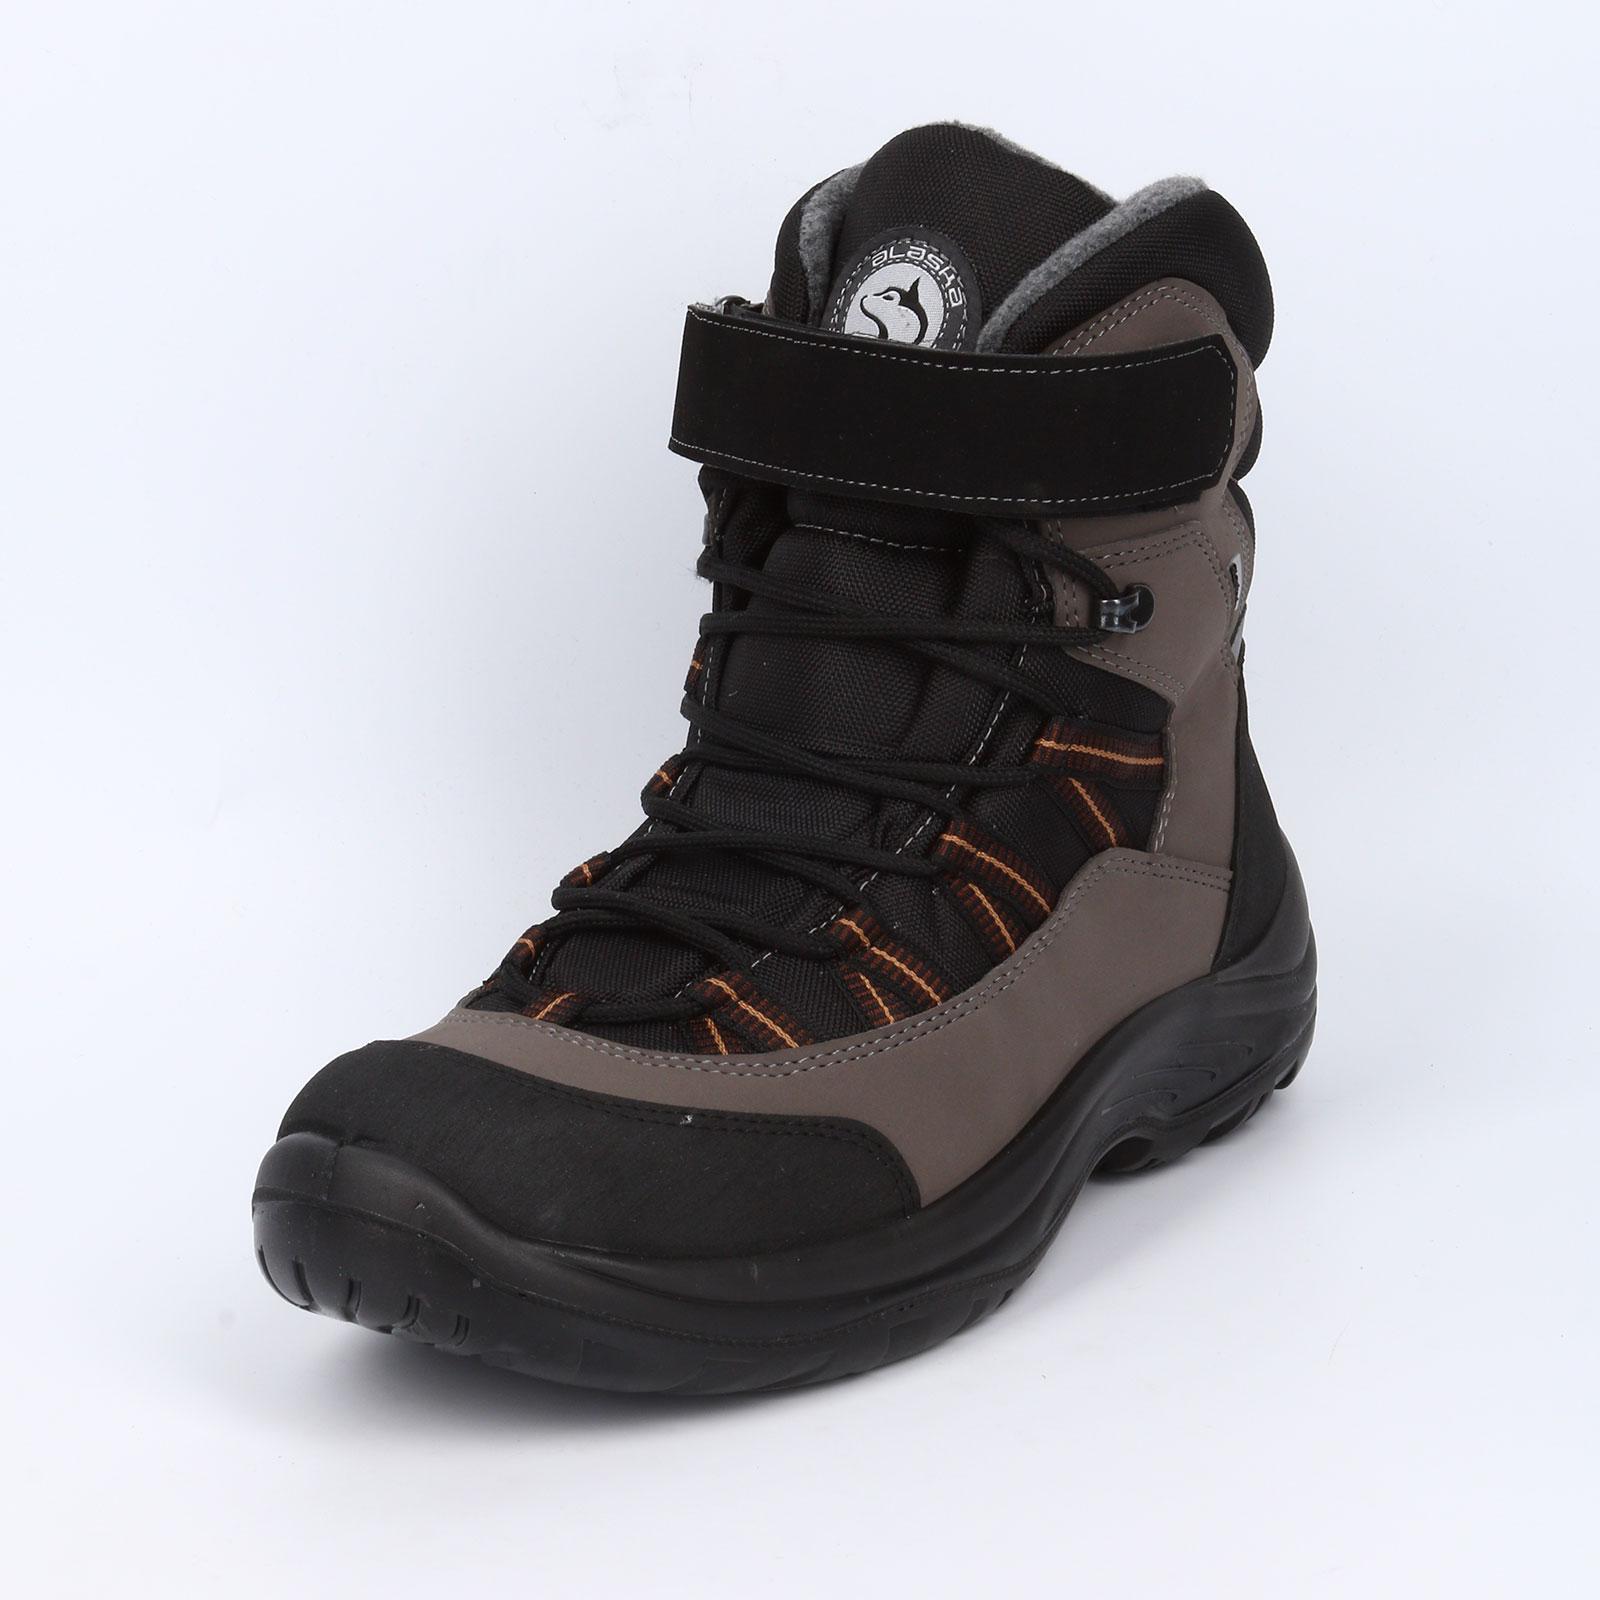 Ботинки мужские на липучке и шнуровке